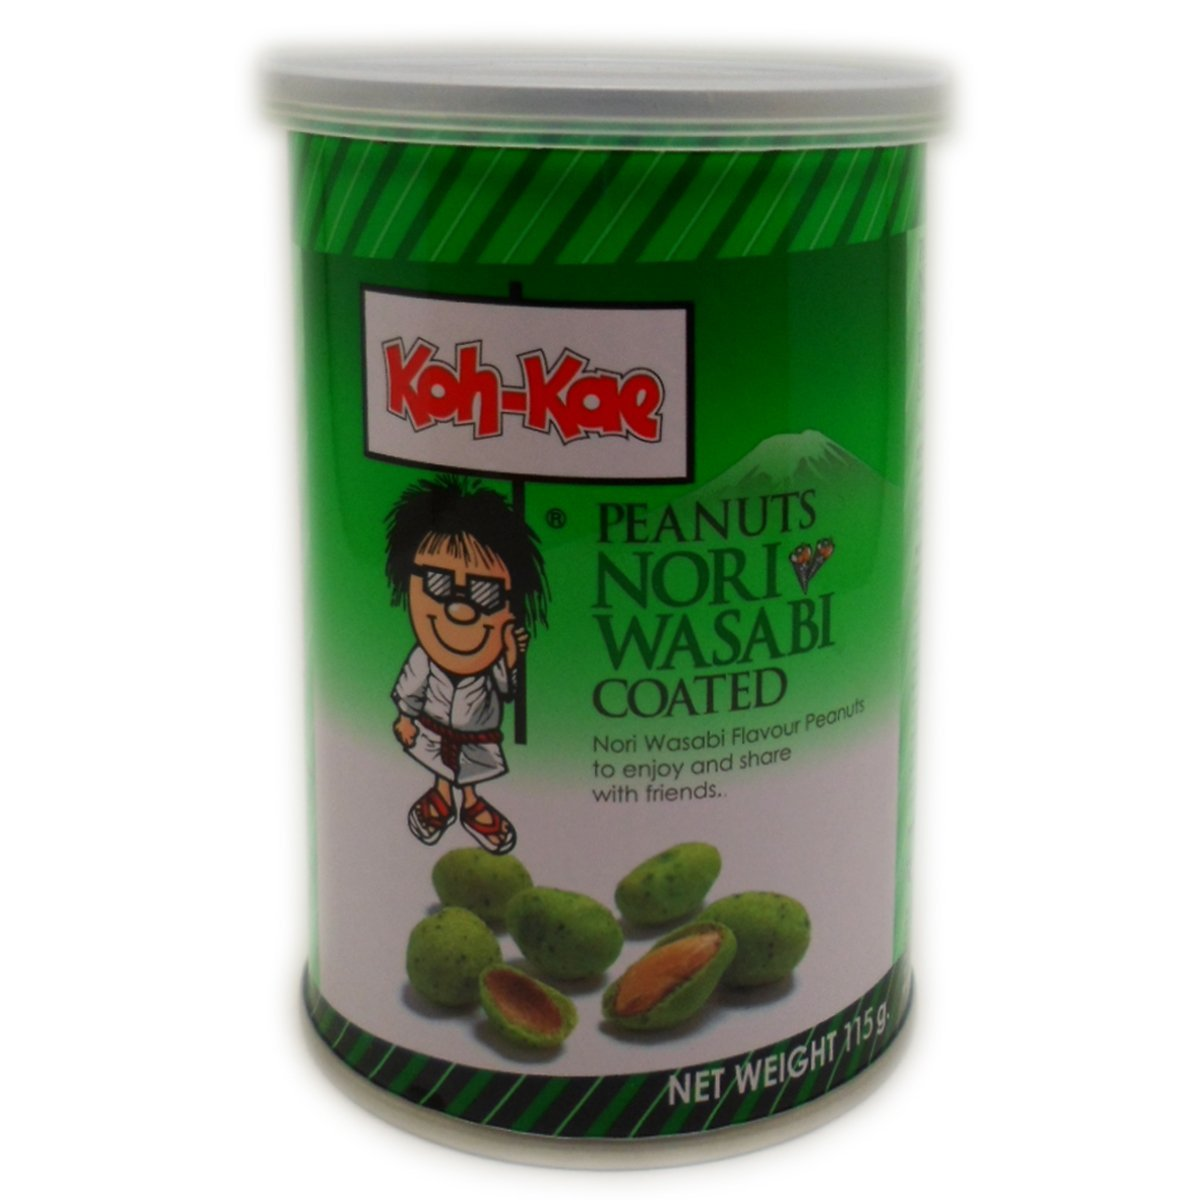 Koh-kae Snack Peanut Nori Wasabi Flavour Coated 115 G (4.06 Oz) X